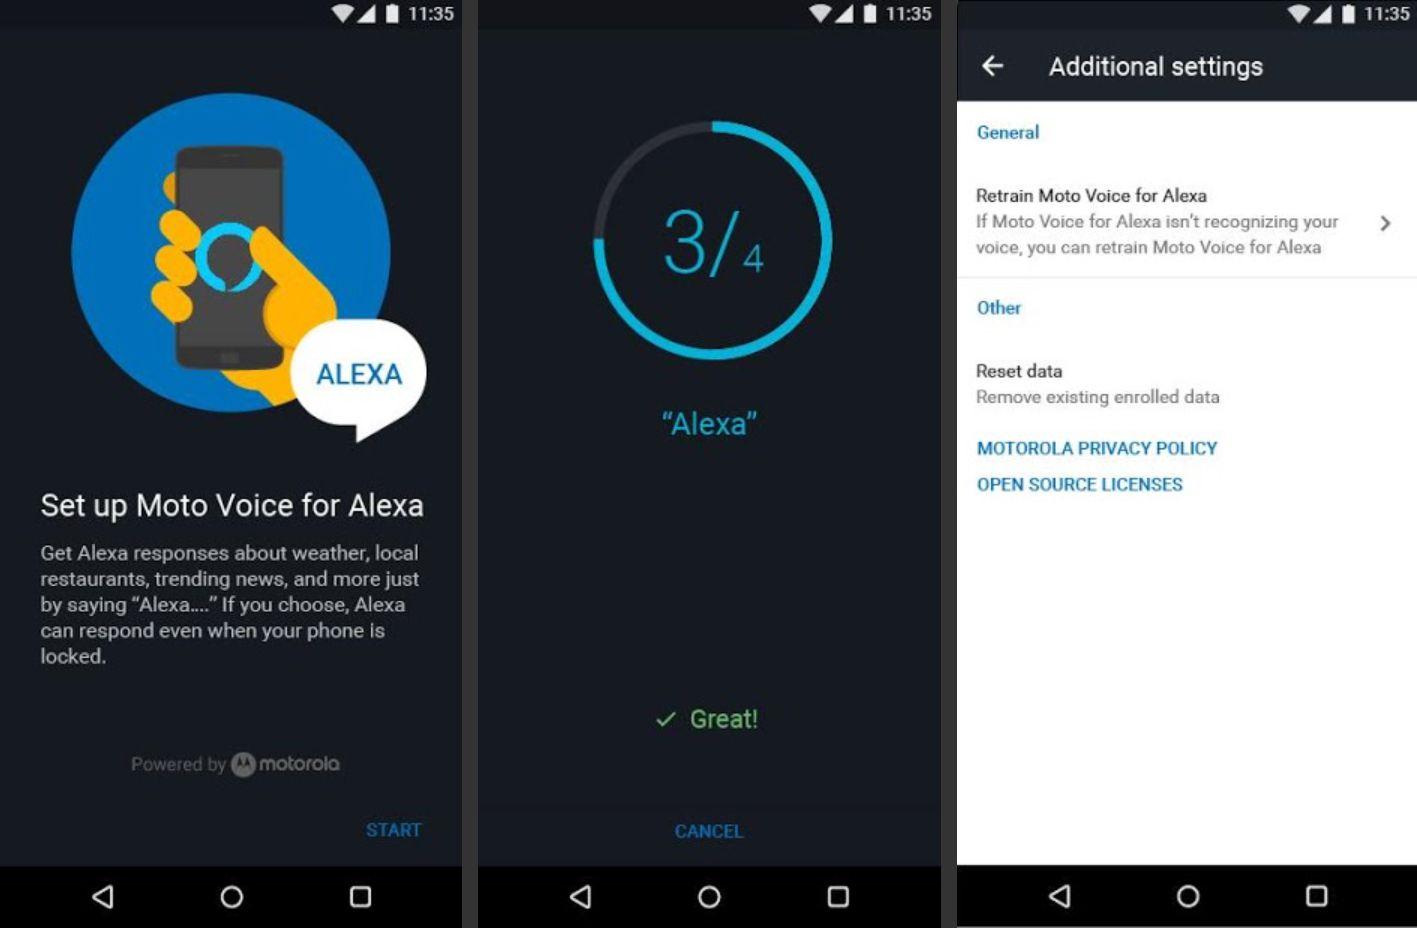 Moto Voice app showing the Alexa setup